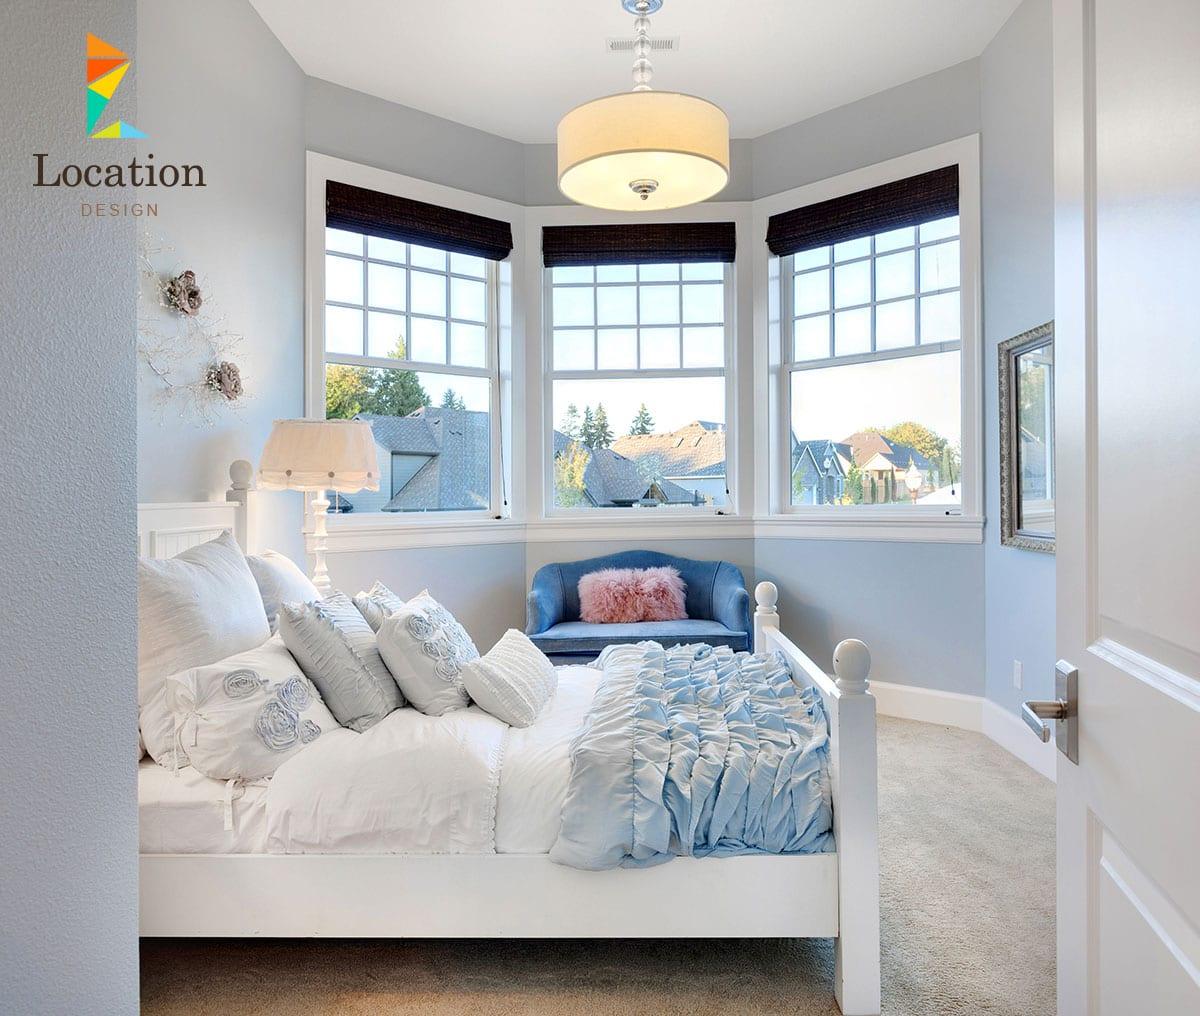 Photo of بالصور غرف نوم كلاسيكية رائعة وجميلة للبنات 2020